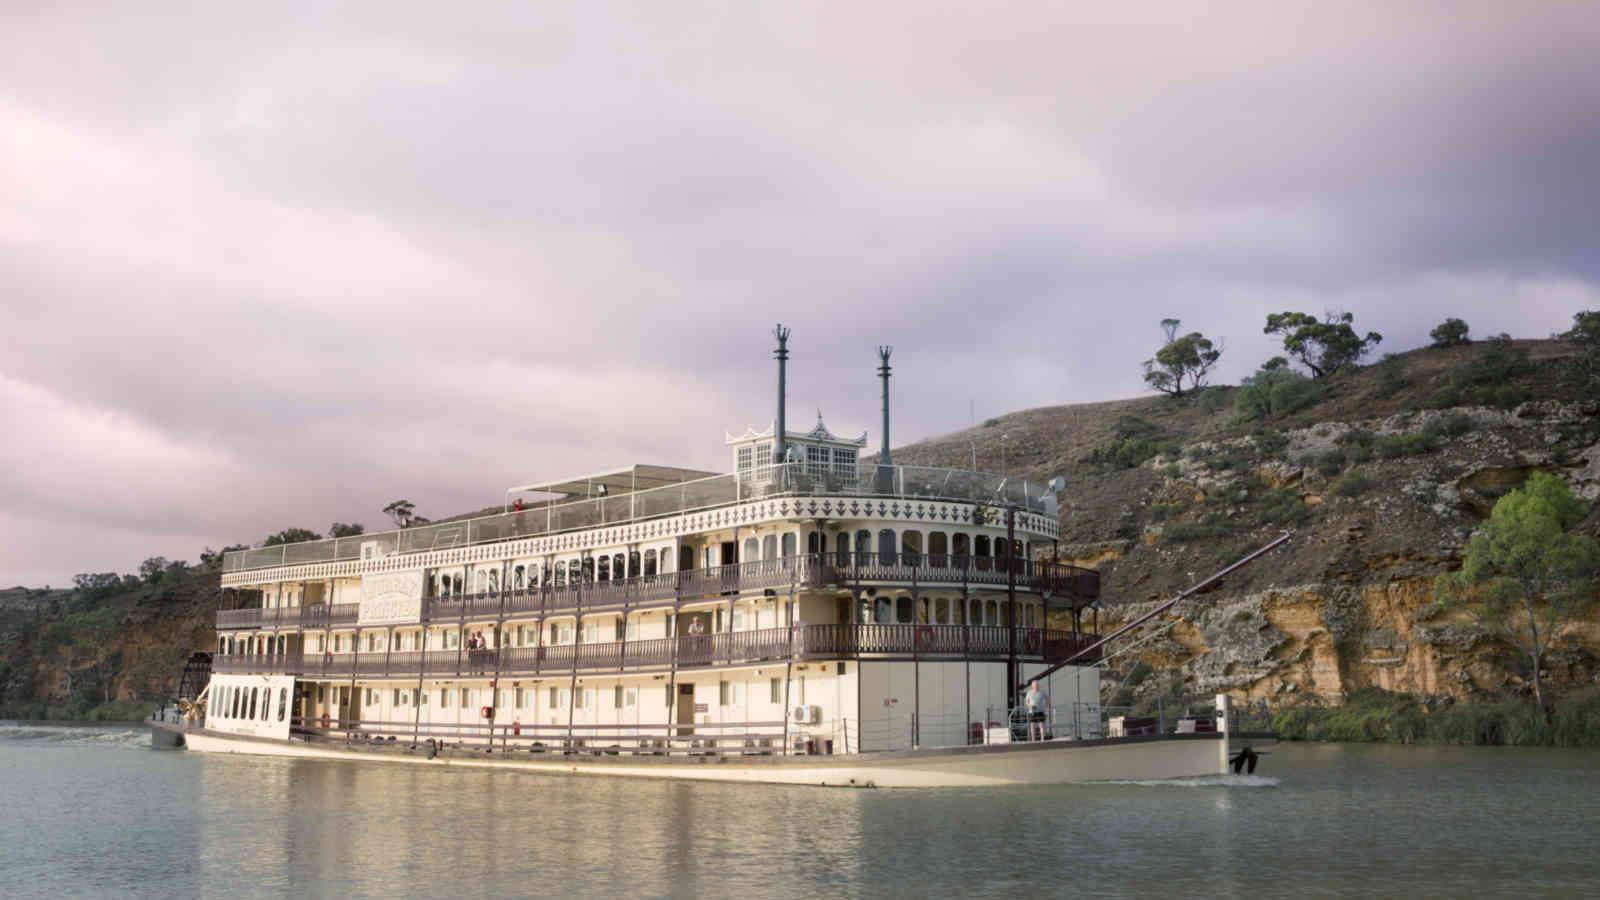 4-Night-river-cruises-vessel-image